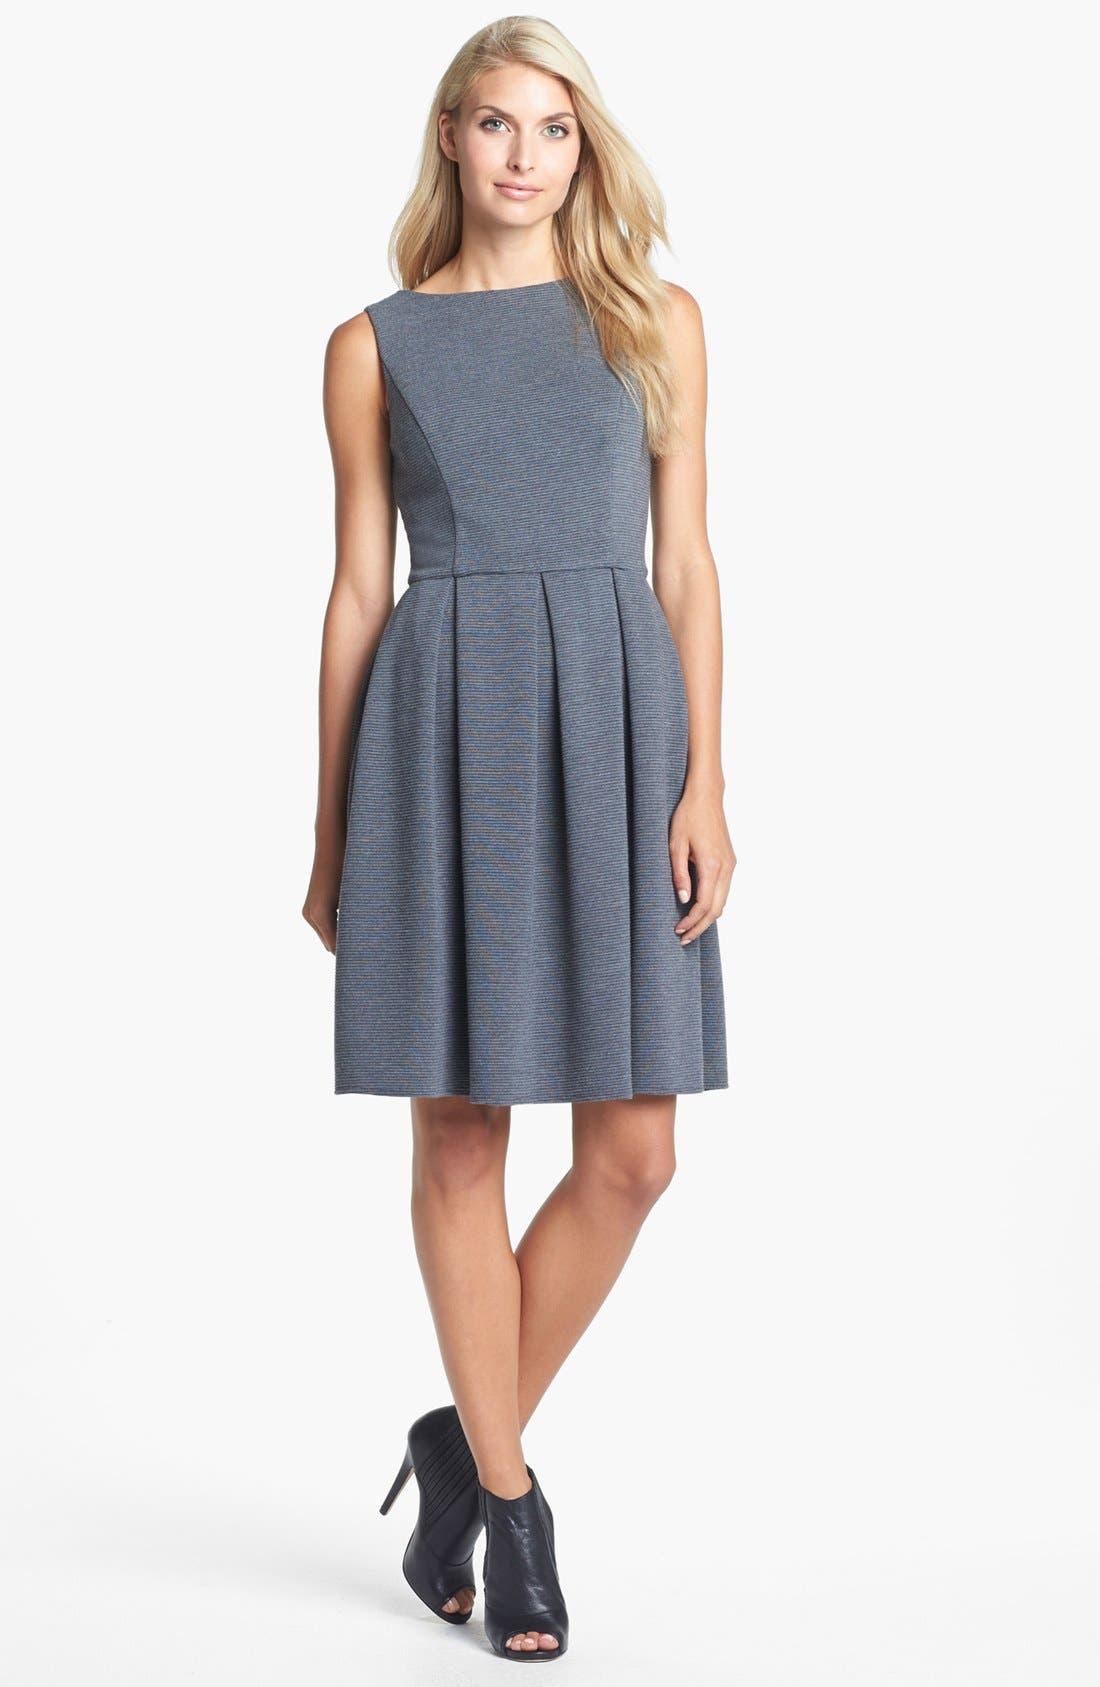 Alternate Image 1 Selected - Isaac Mizrahi New York Ponte Knit Fit & Flare Dress